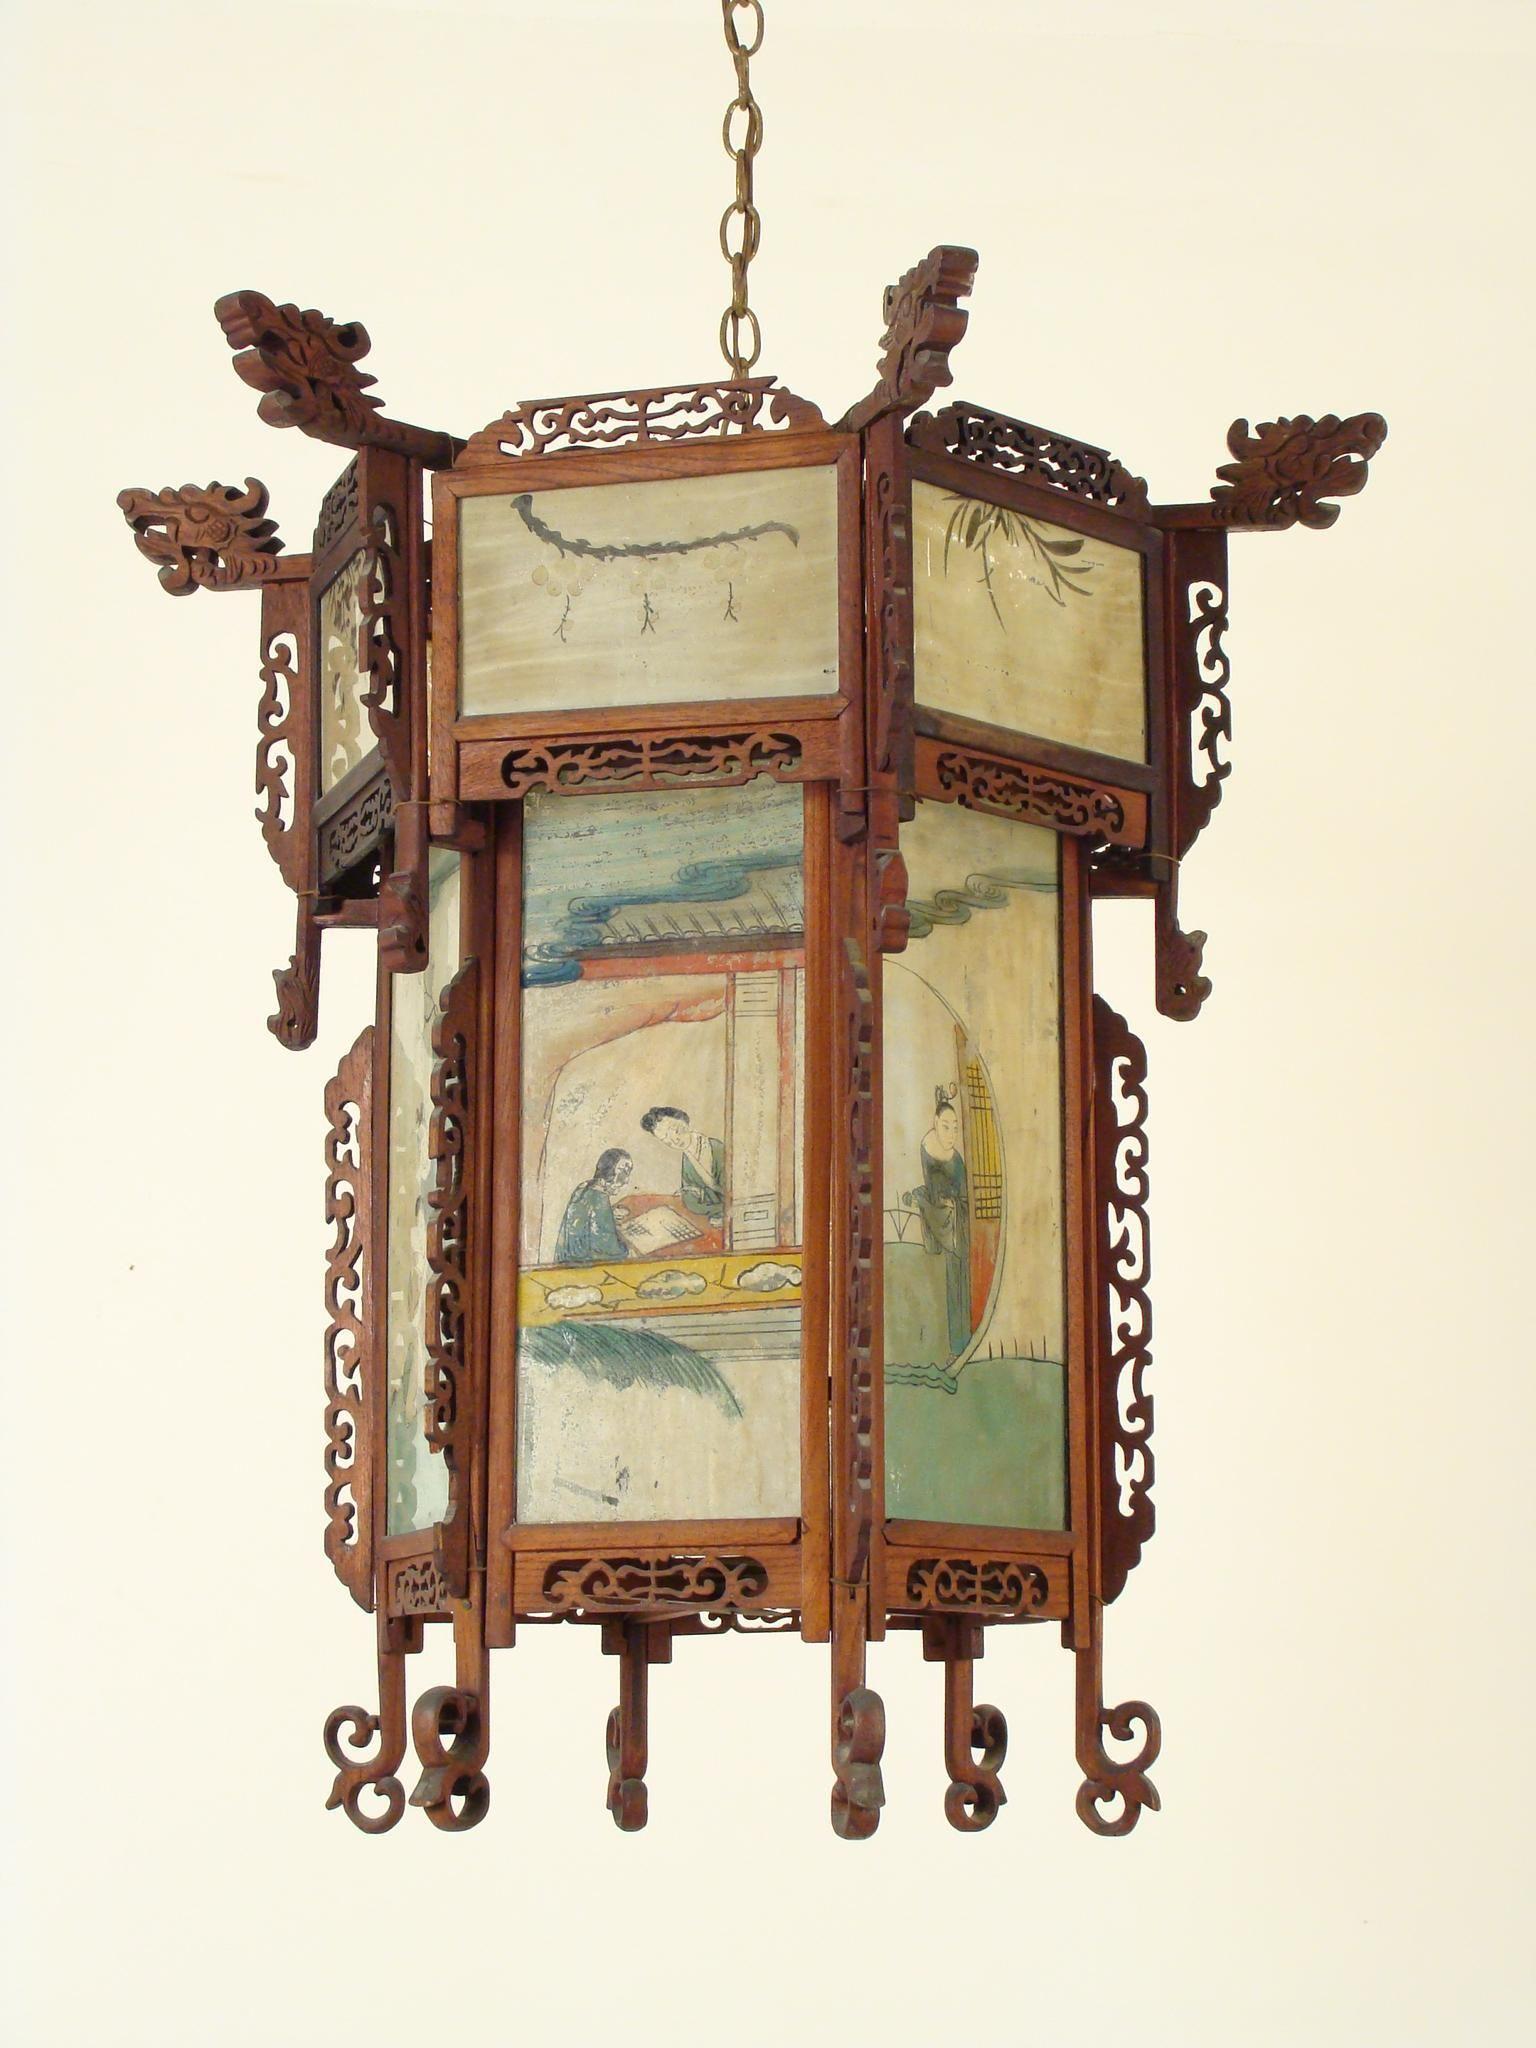 Chinese Lantern With Eglomise Glass Panels Chinese Lanterns Wooden Lanterns Chinese Lamps